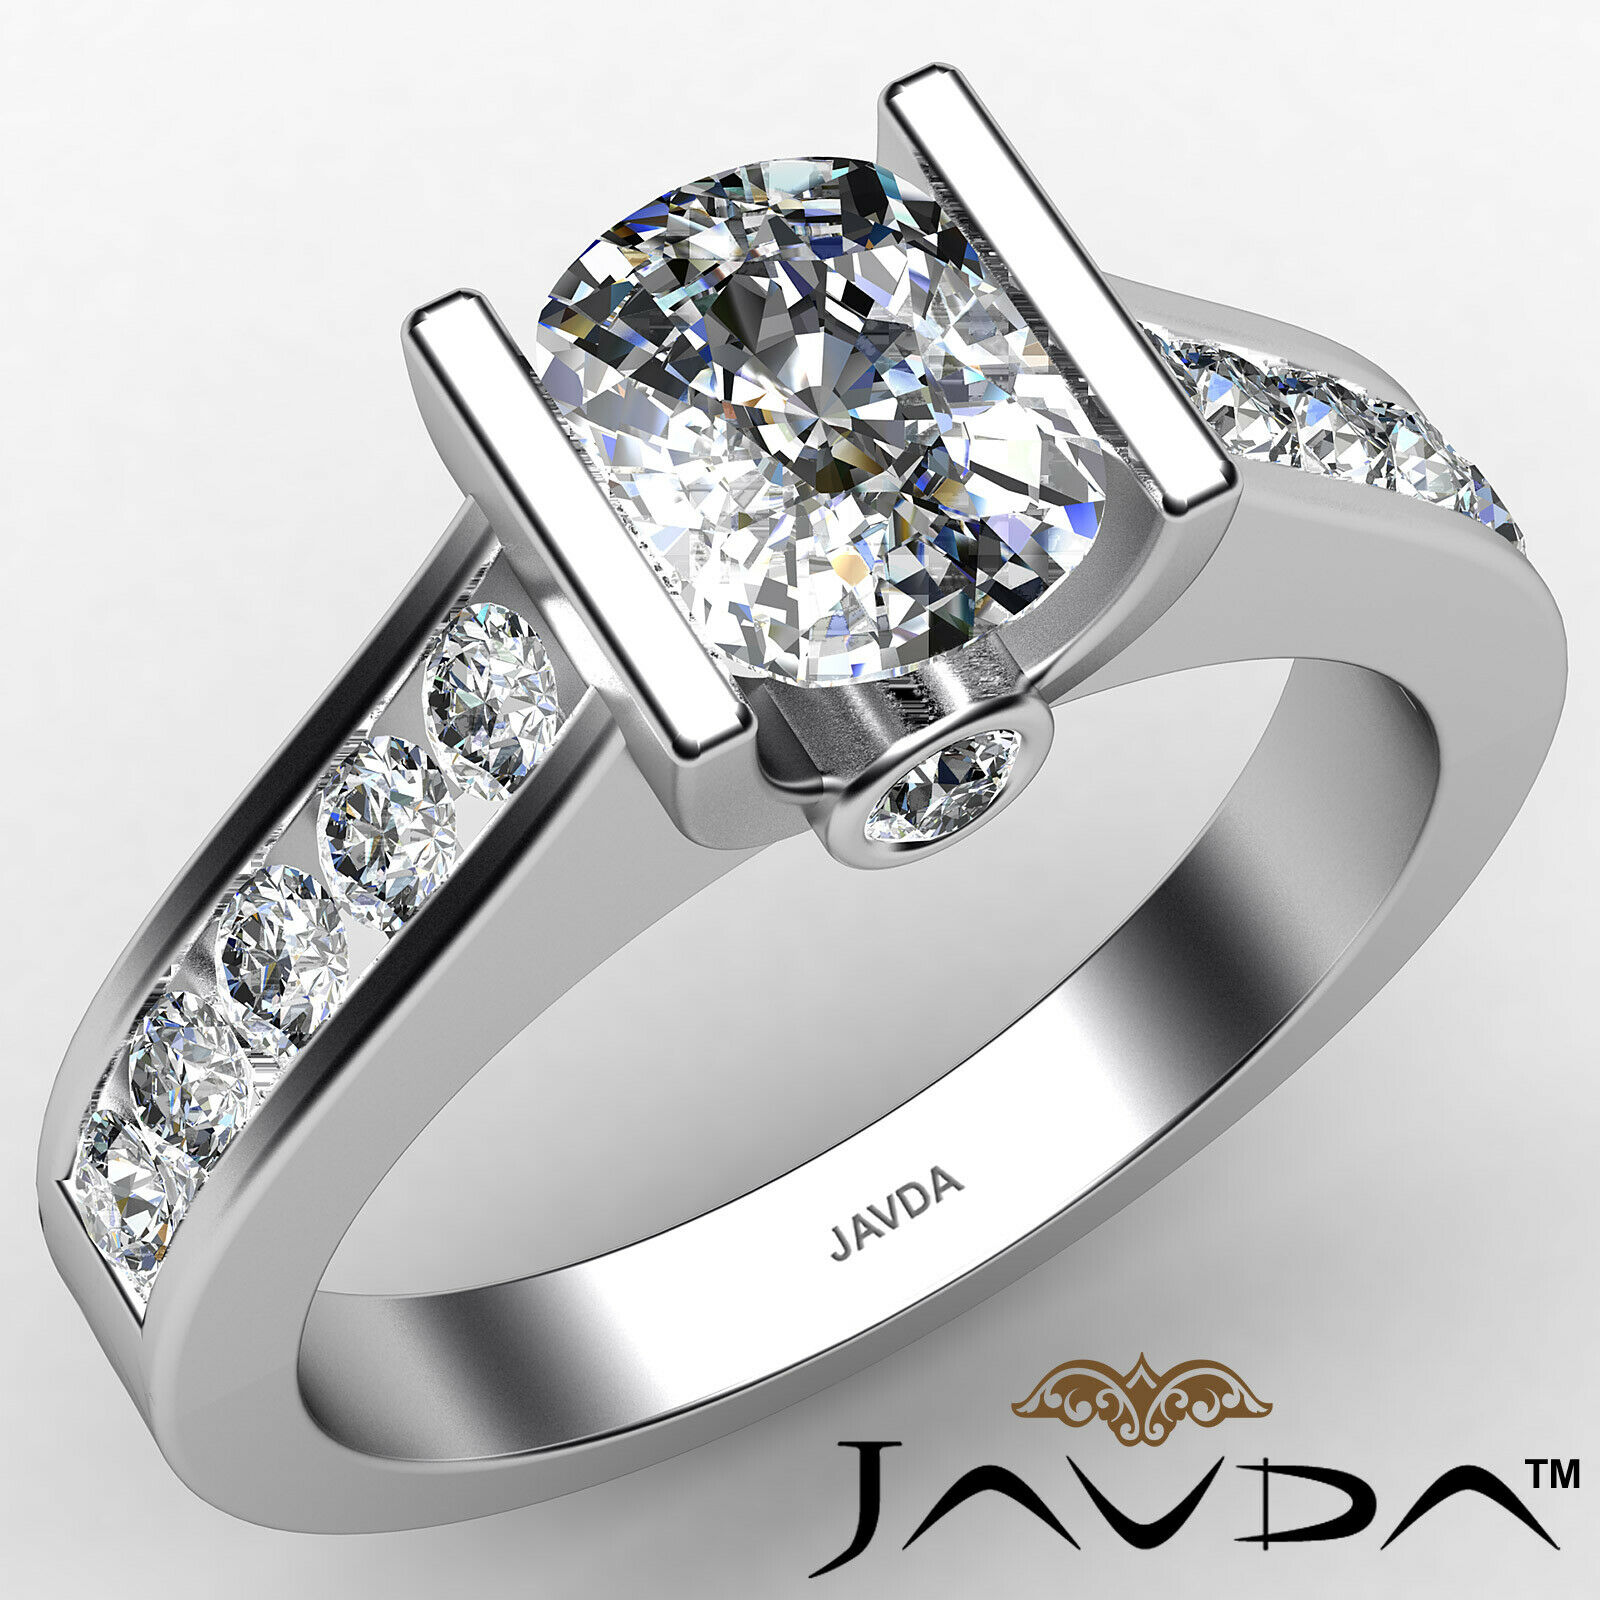 Bezel Cushion Diamond Engagement Women's Ring GIA, J Color SI1 clarity 1.53 ctw.